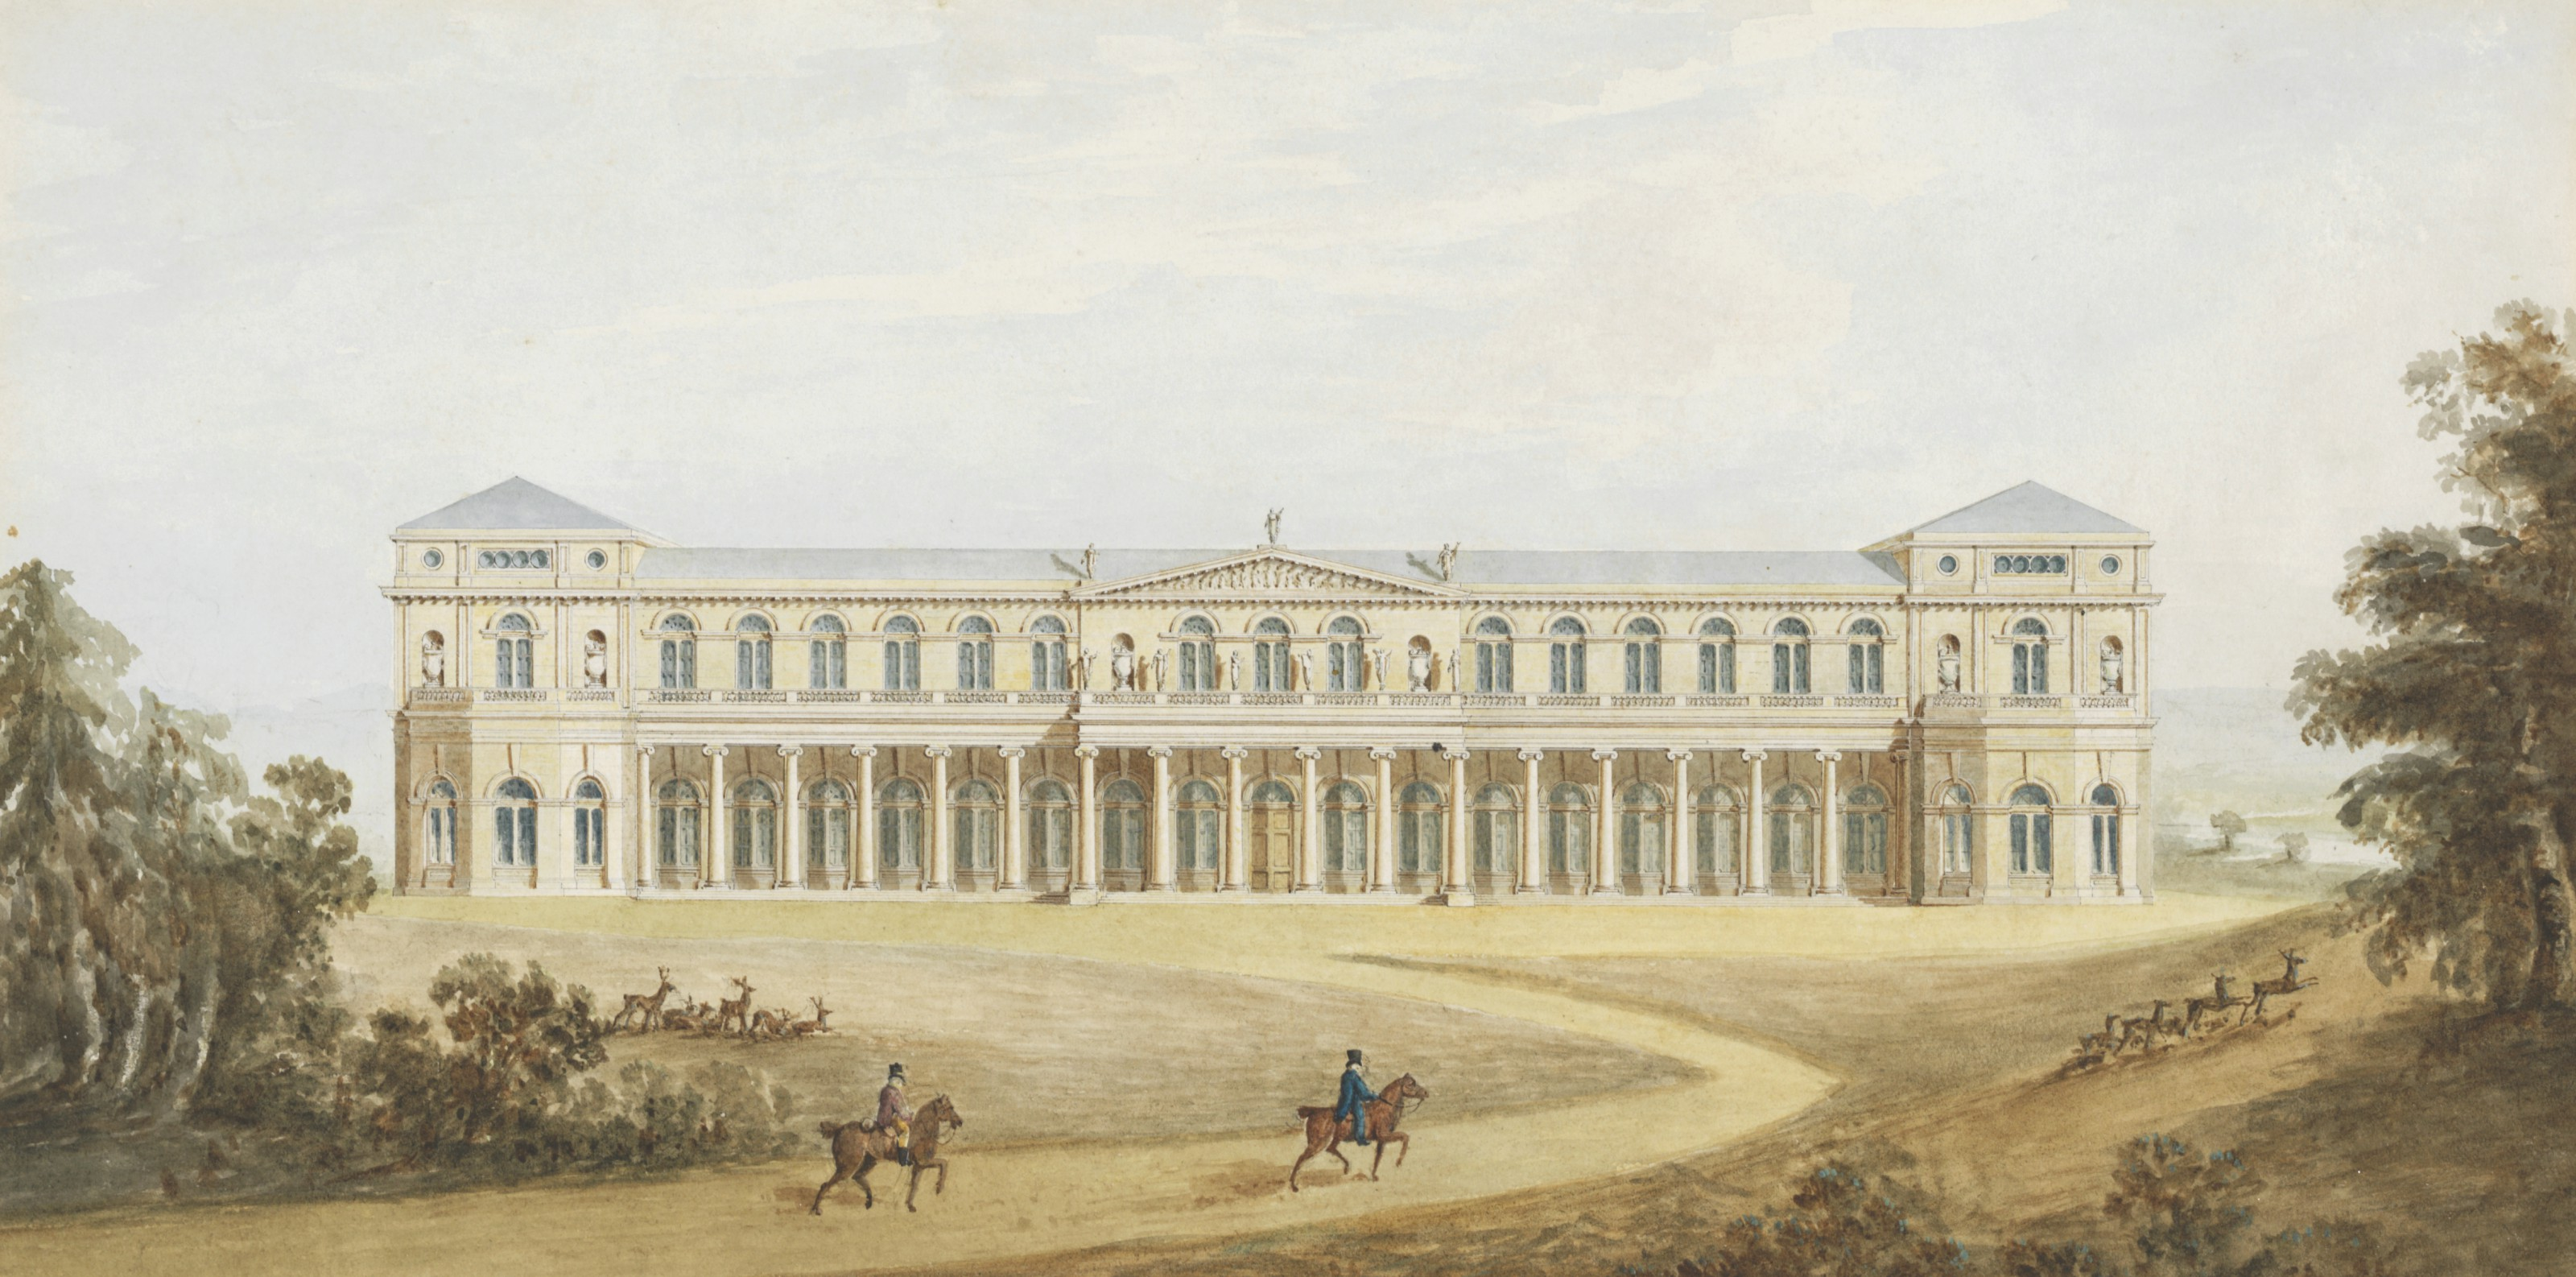 ATTRIBUTED TO BENJAMIN DEAN WYATT (LONDON 1775–1852) OR PHILIP WILLIAM WYATT (LONDON 1785-1835))